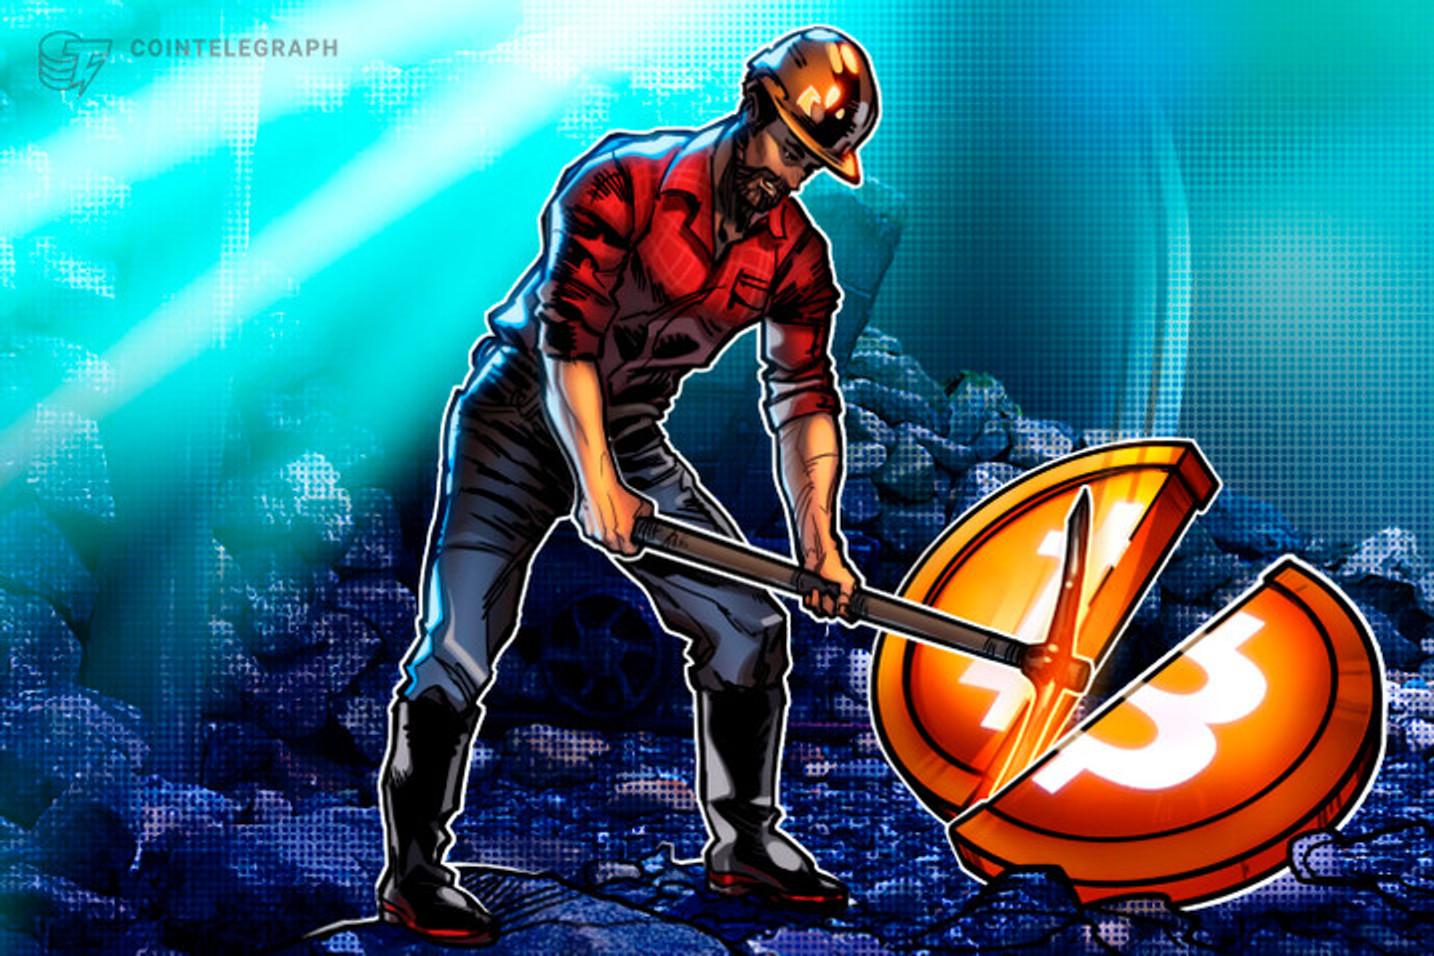 Para Sebastián Aldasoro, Head of Blockchain de SeSocio, Bitcoin vive una semana histórica